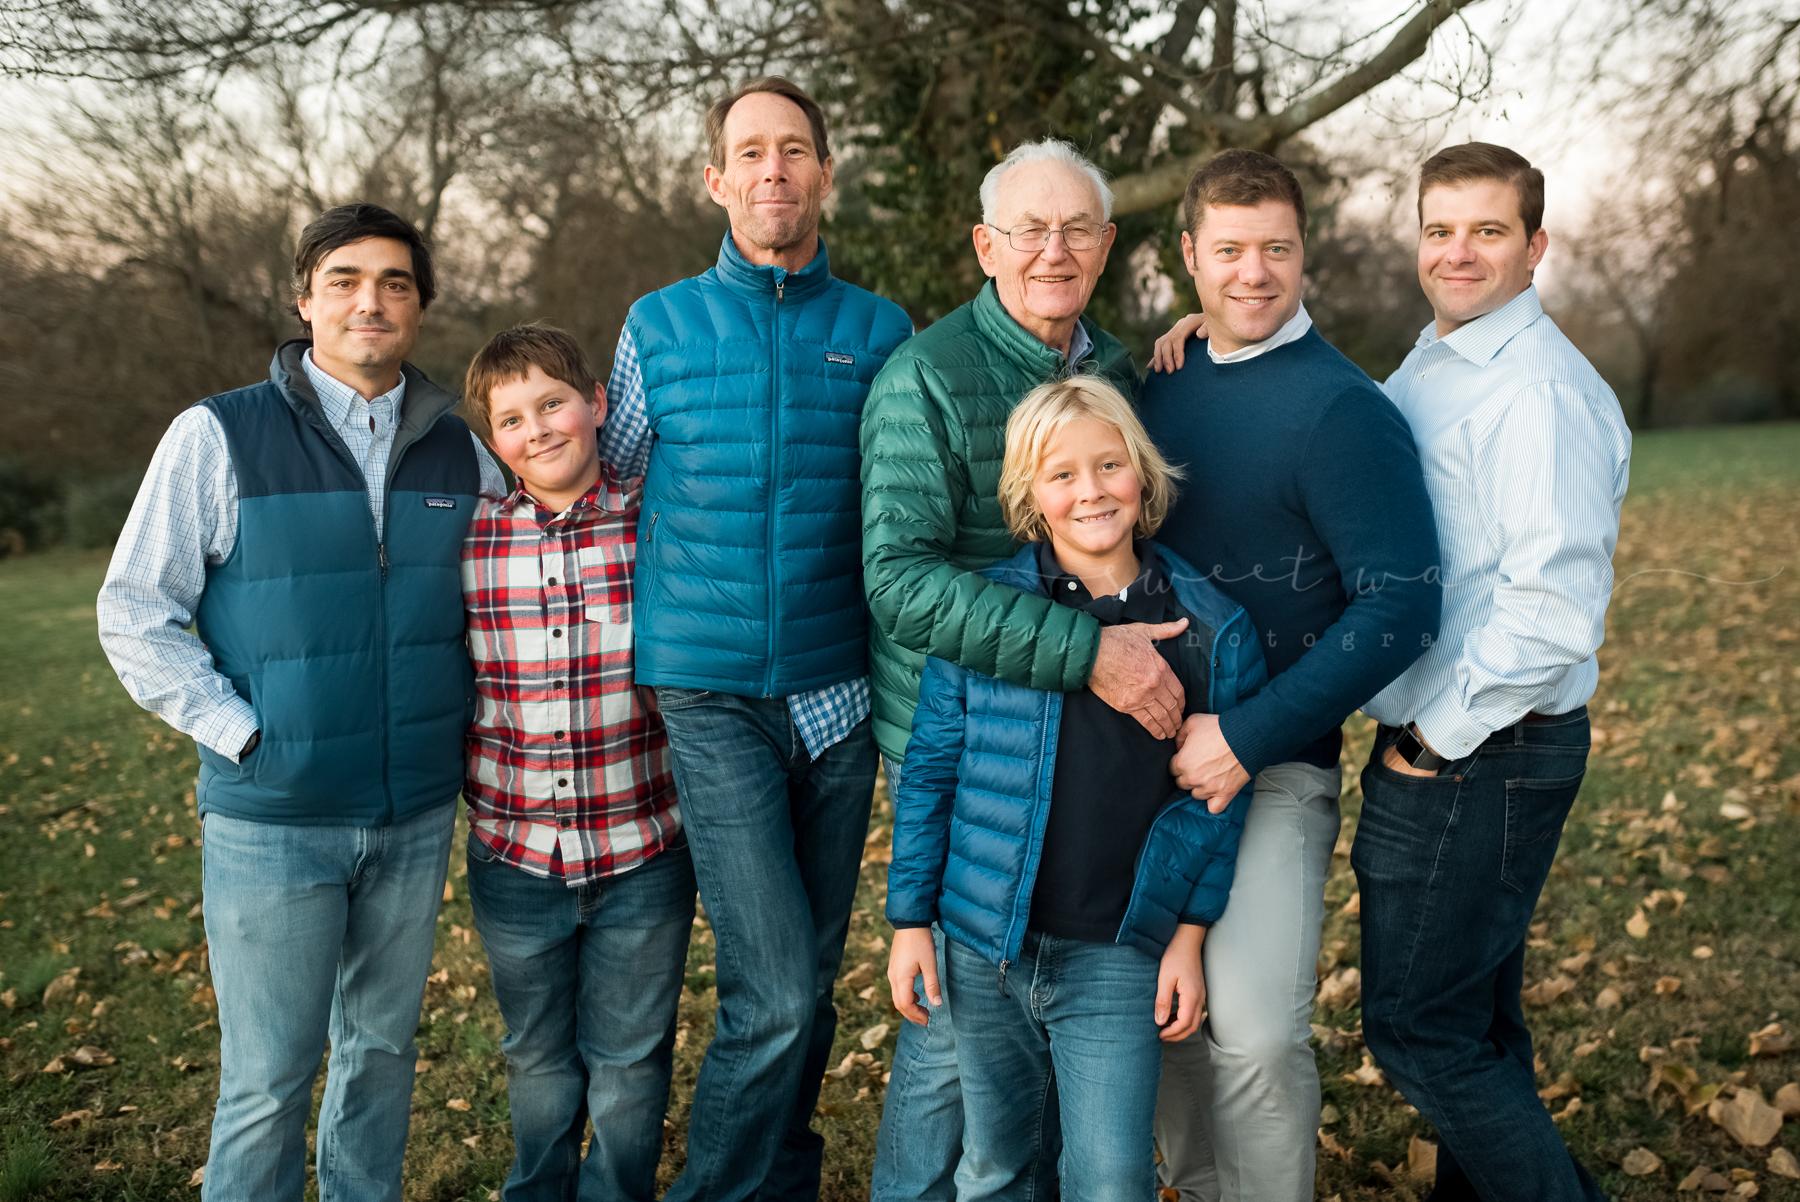 family reunion photographer in kentucky10.jpg